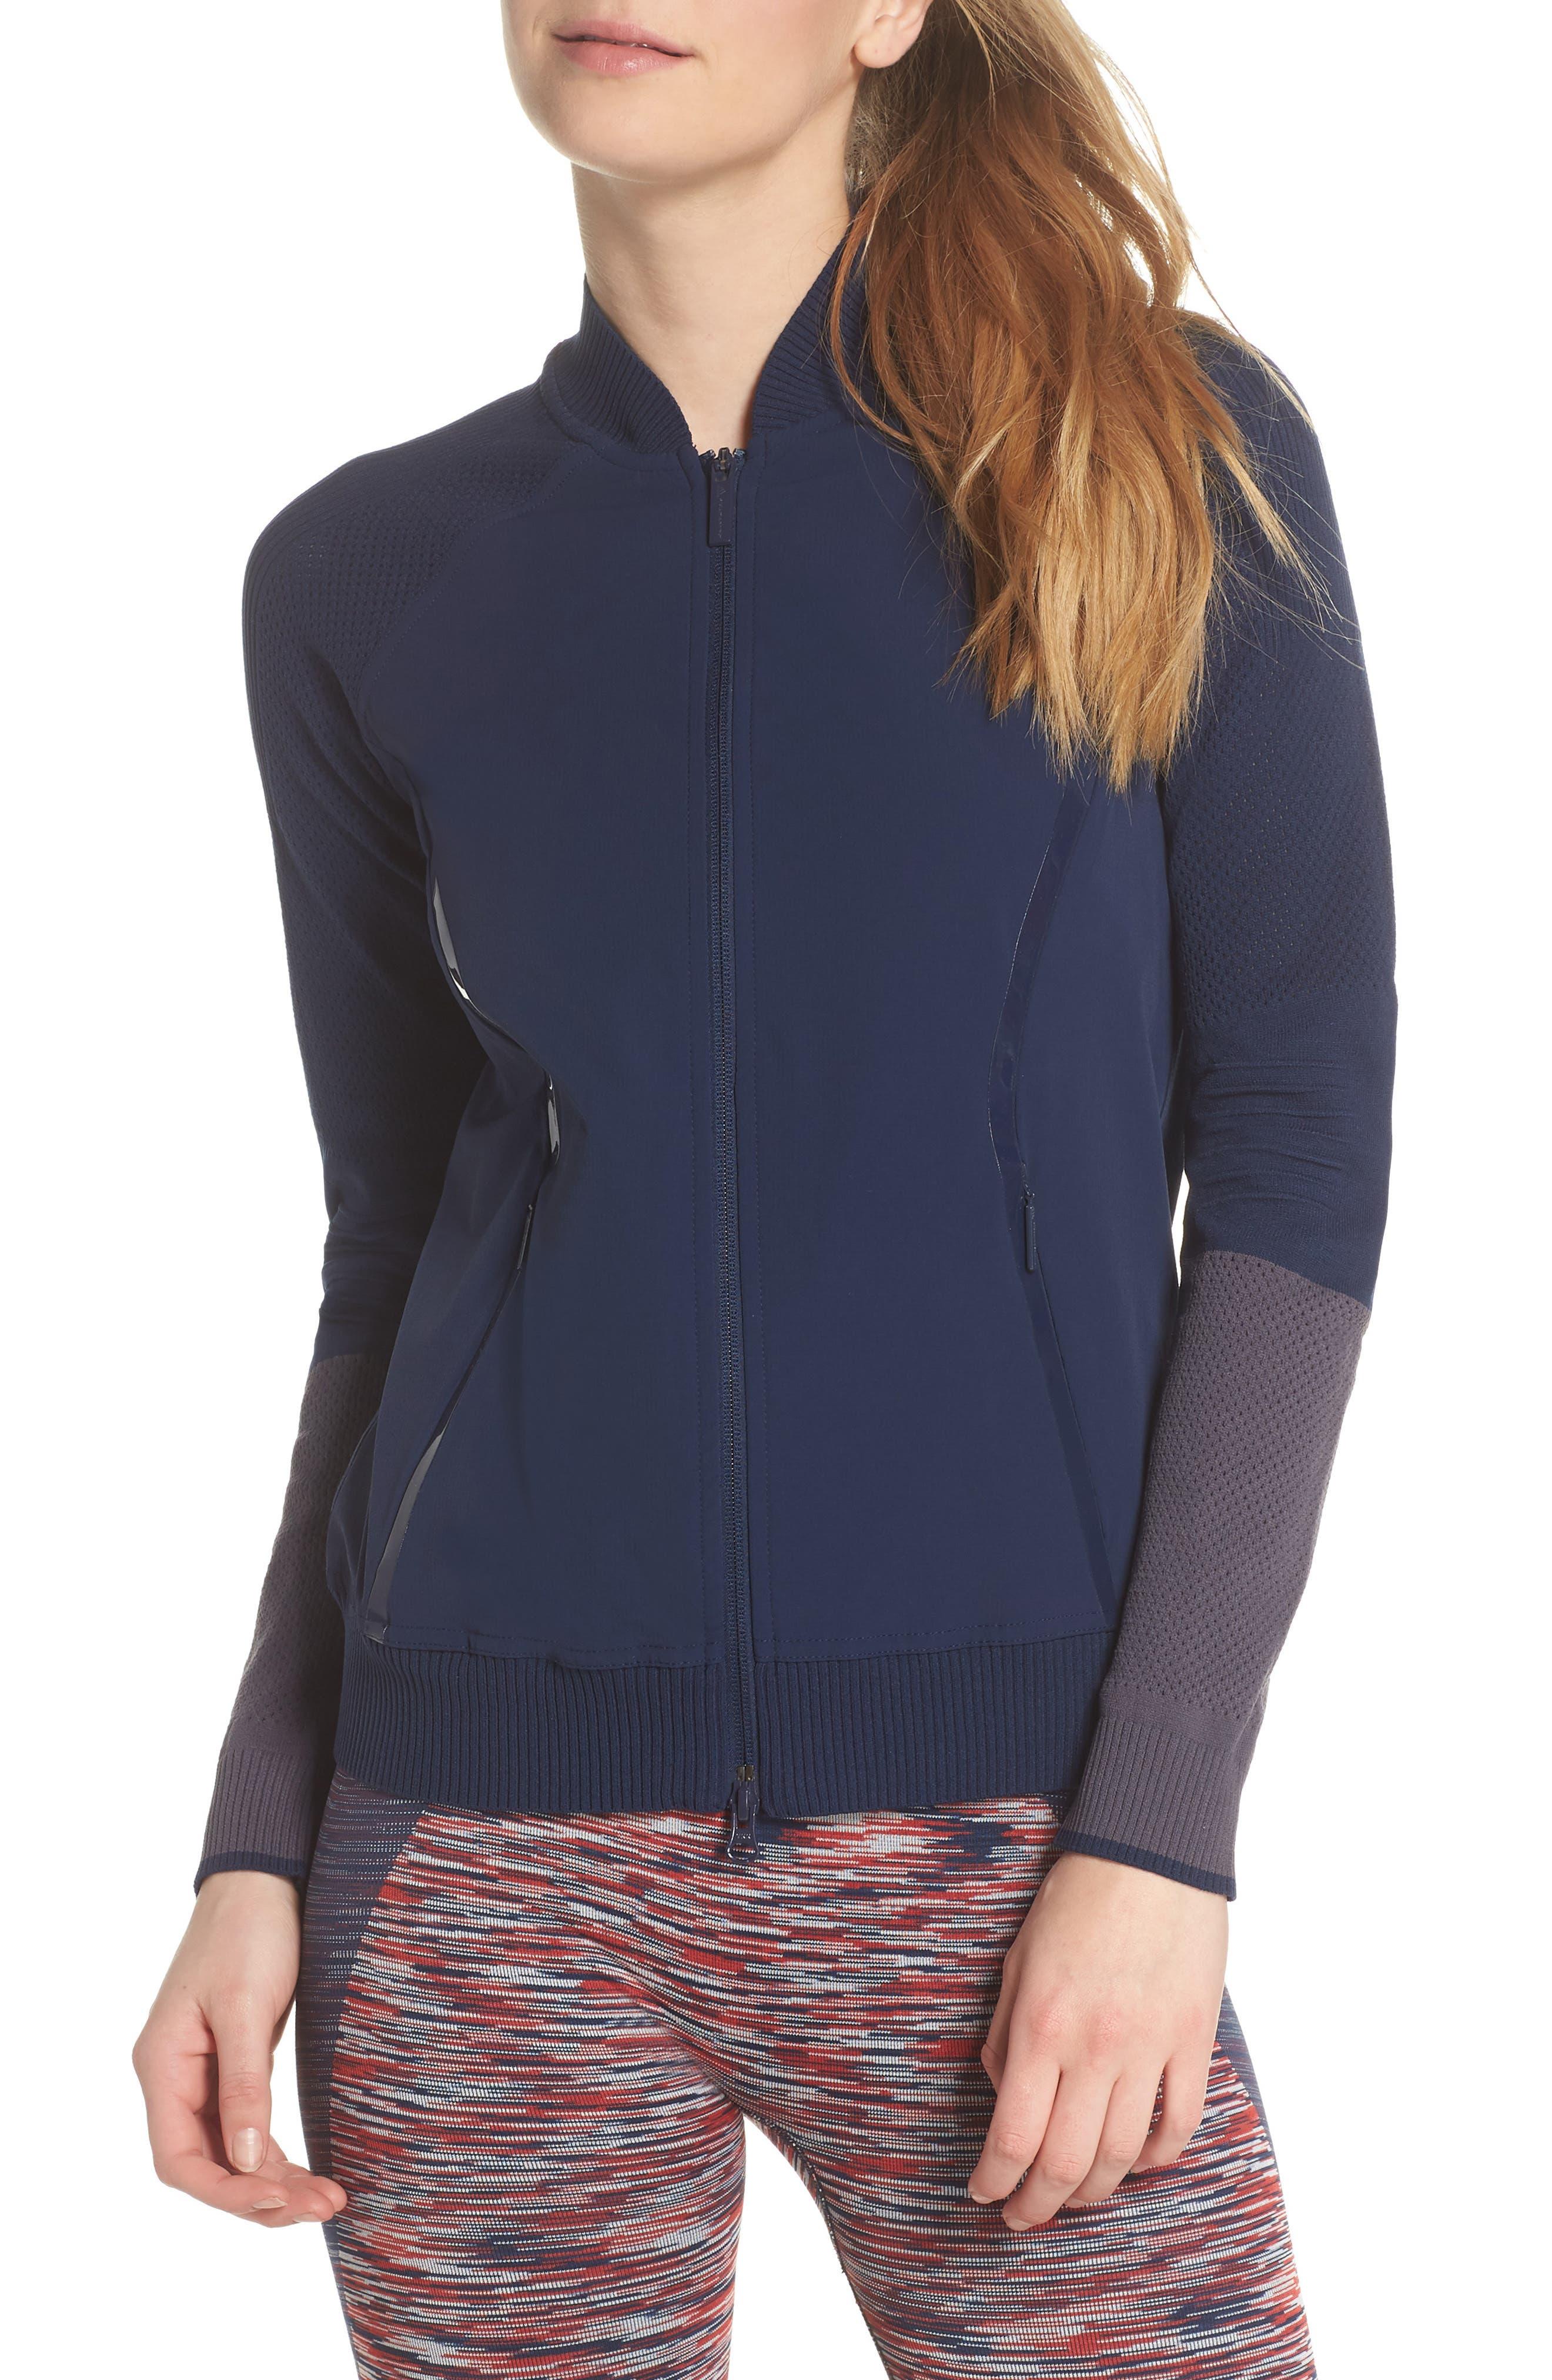 Run Ultra Knit & Woven Jacket,                         Main,                         color, Collegiate Navy